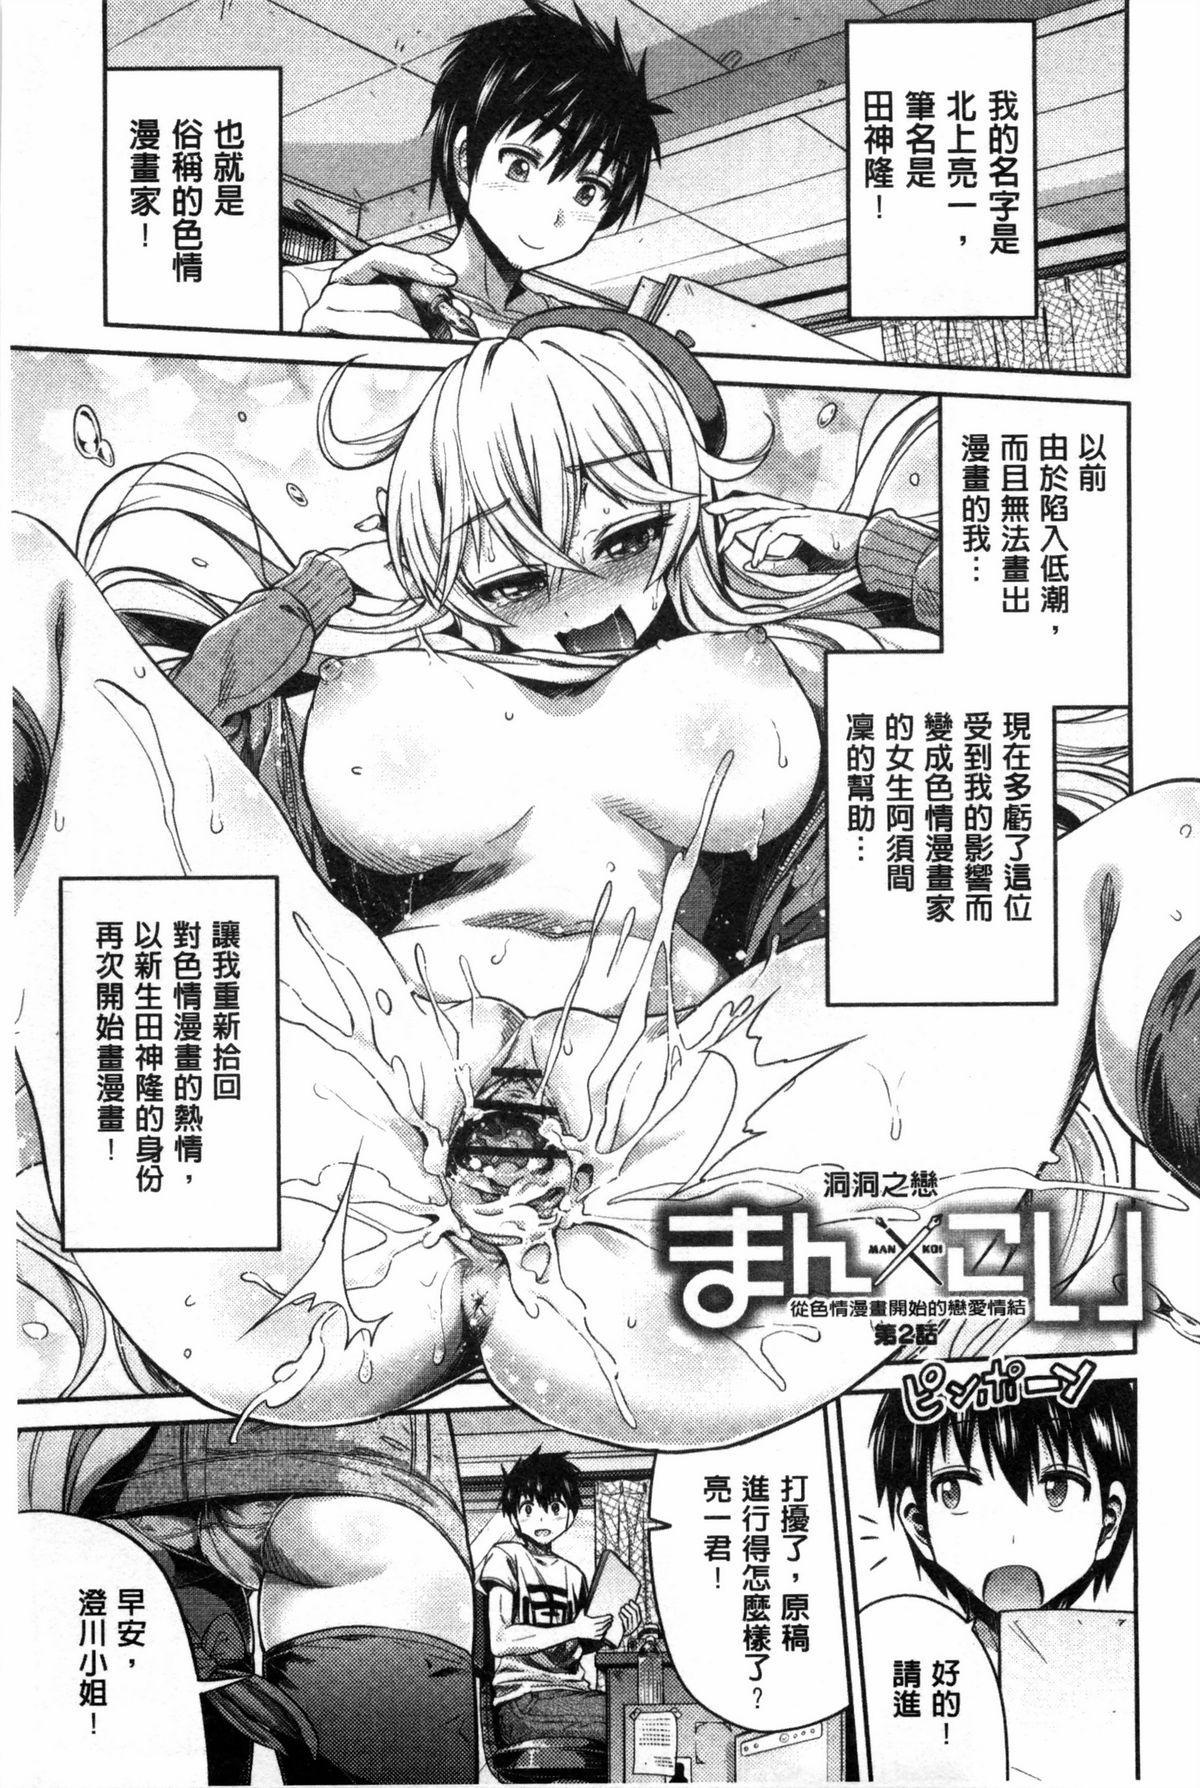 Man x Koi - Ero Manga de Hajimaru Koi no Plot   A漫×戀情 由情色漫畫所萌生的戀之物語 31